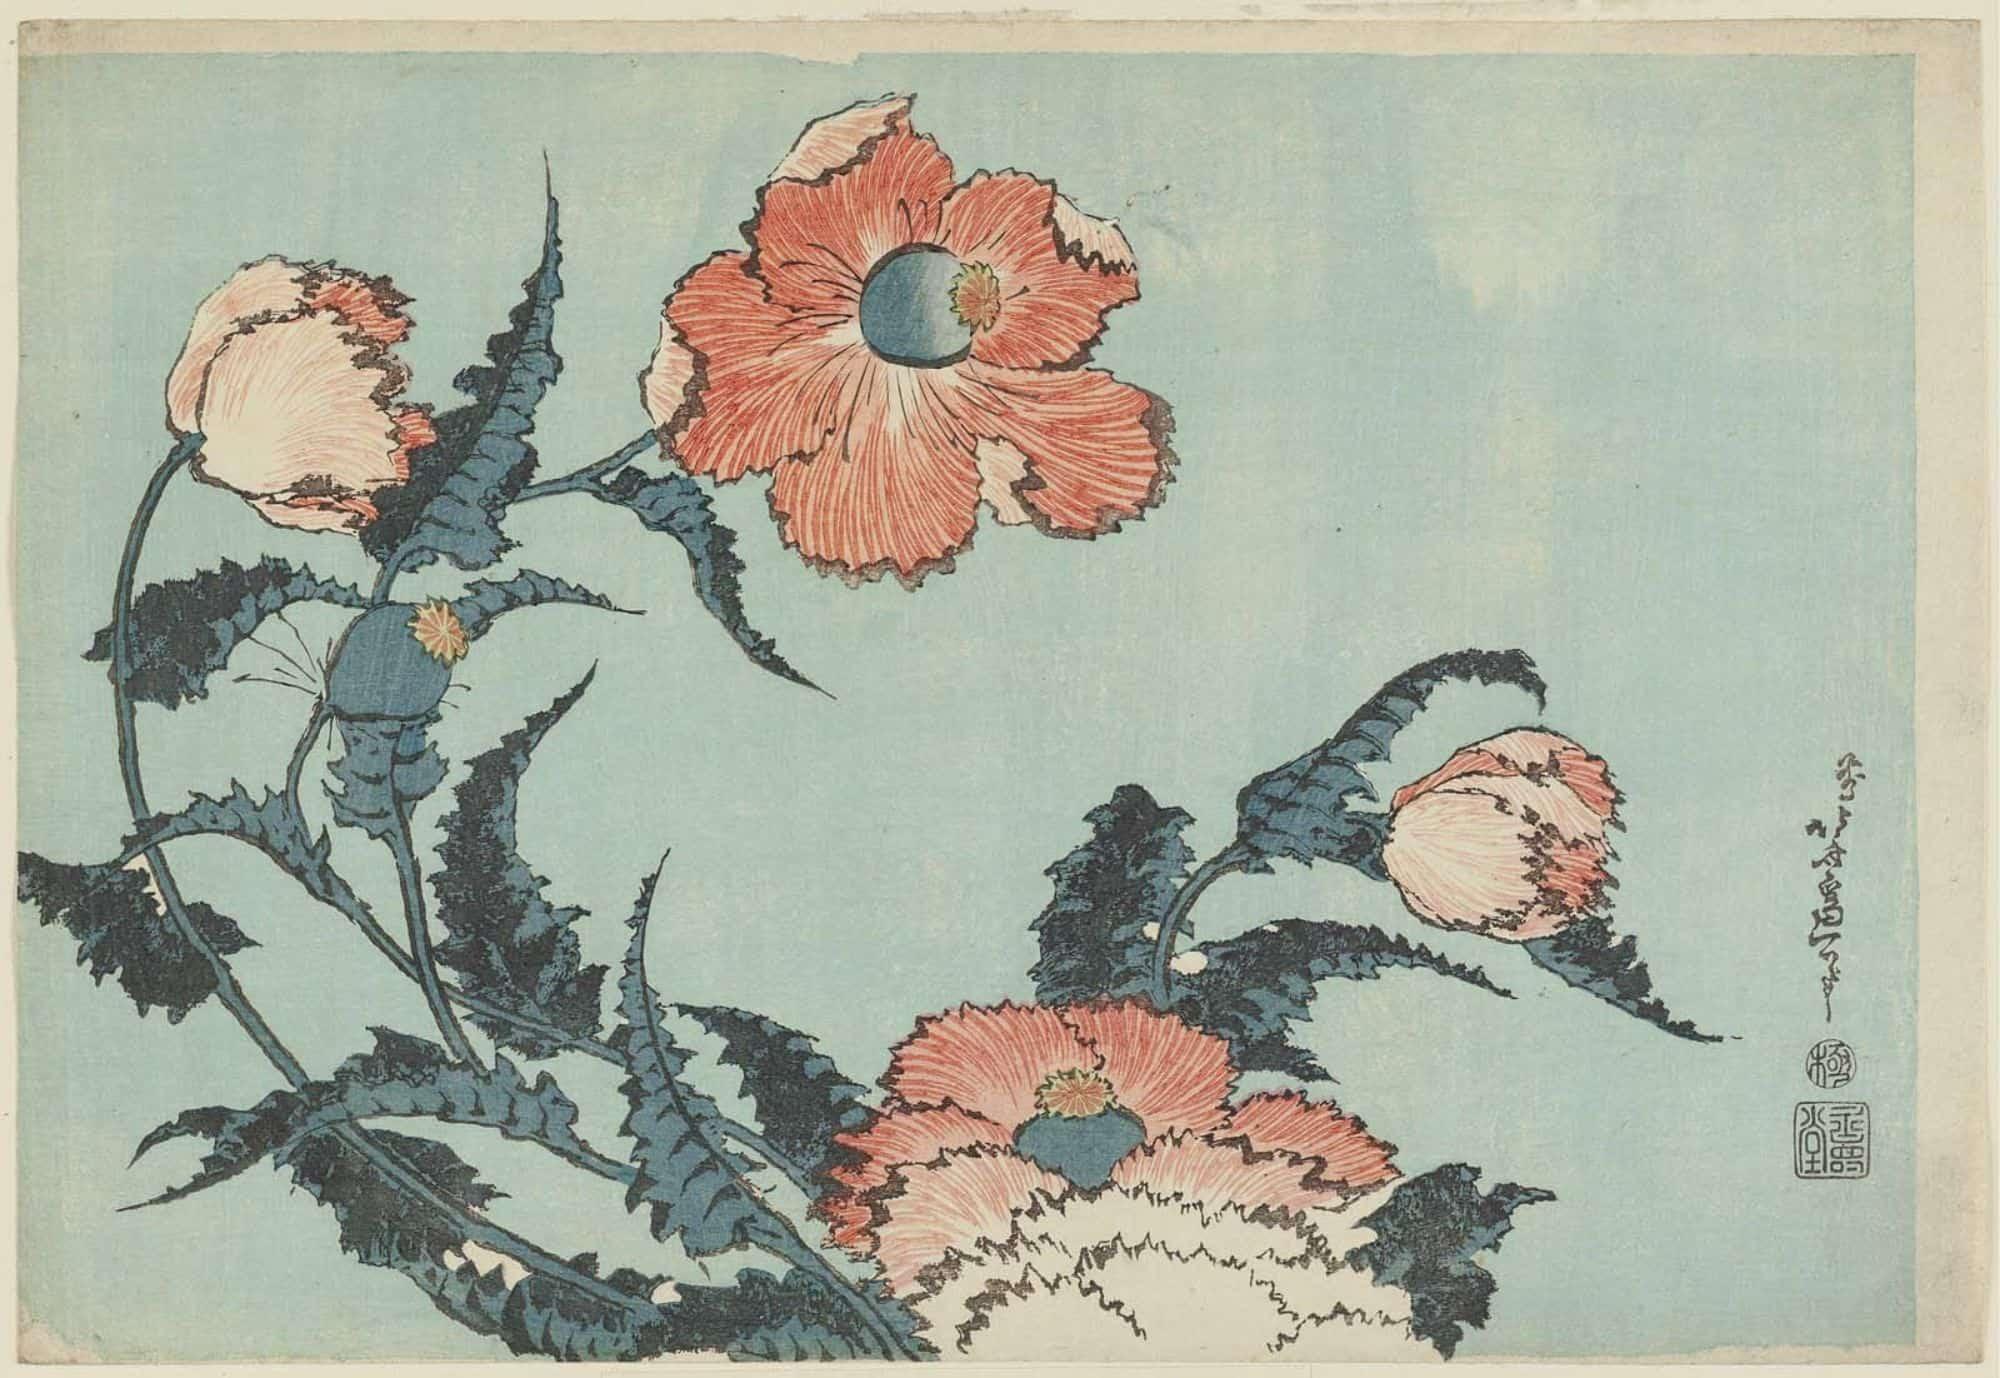 Poppies by hokusai, kacho-ga